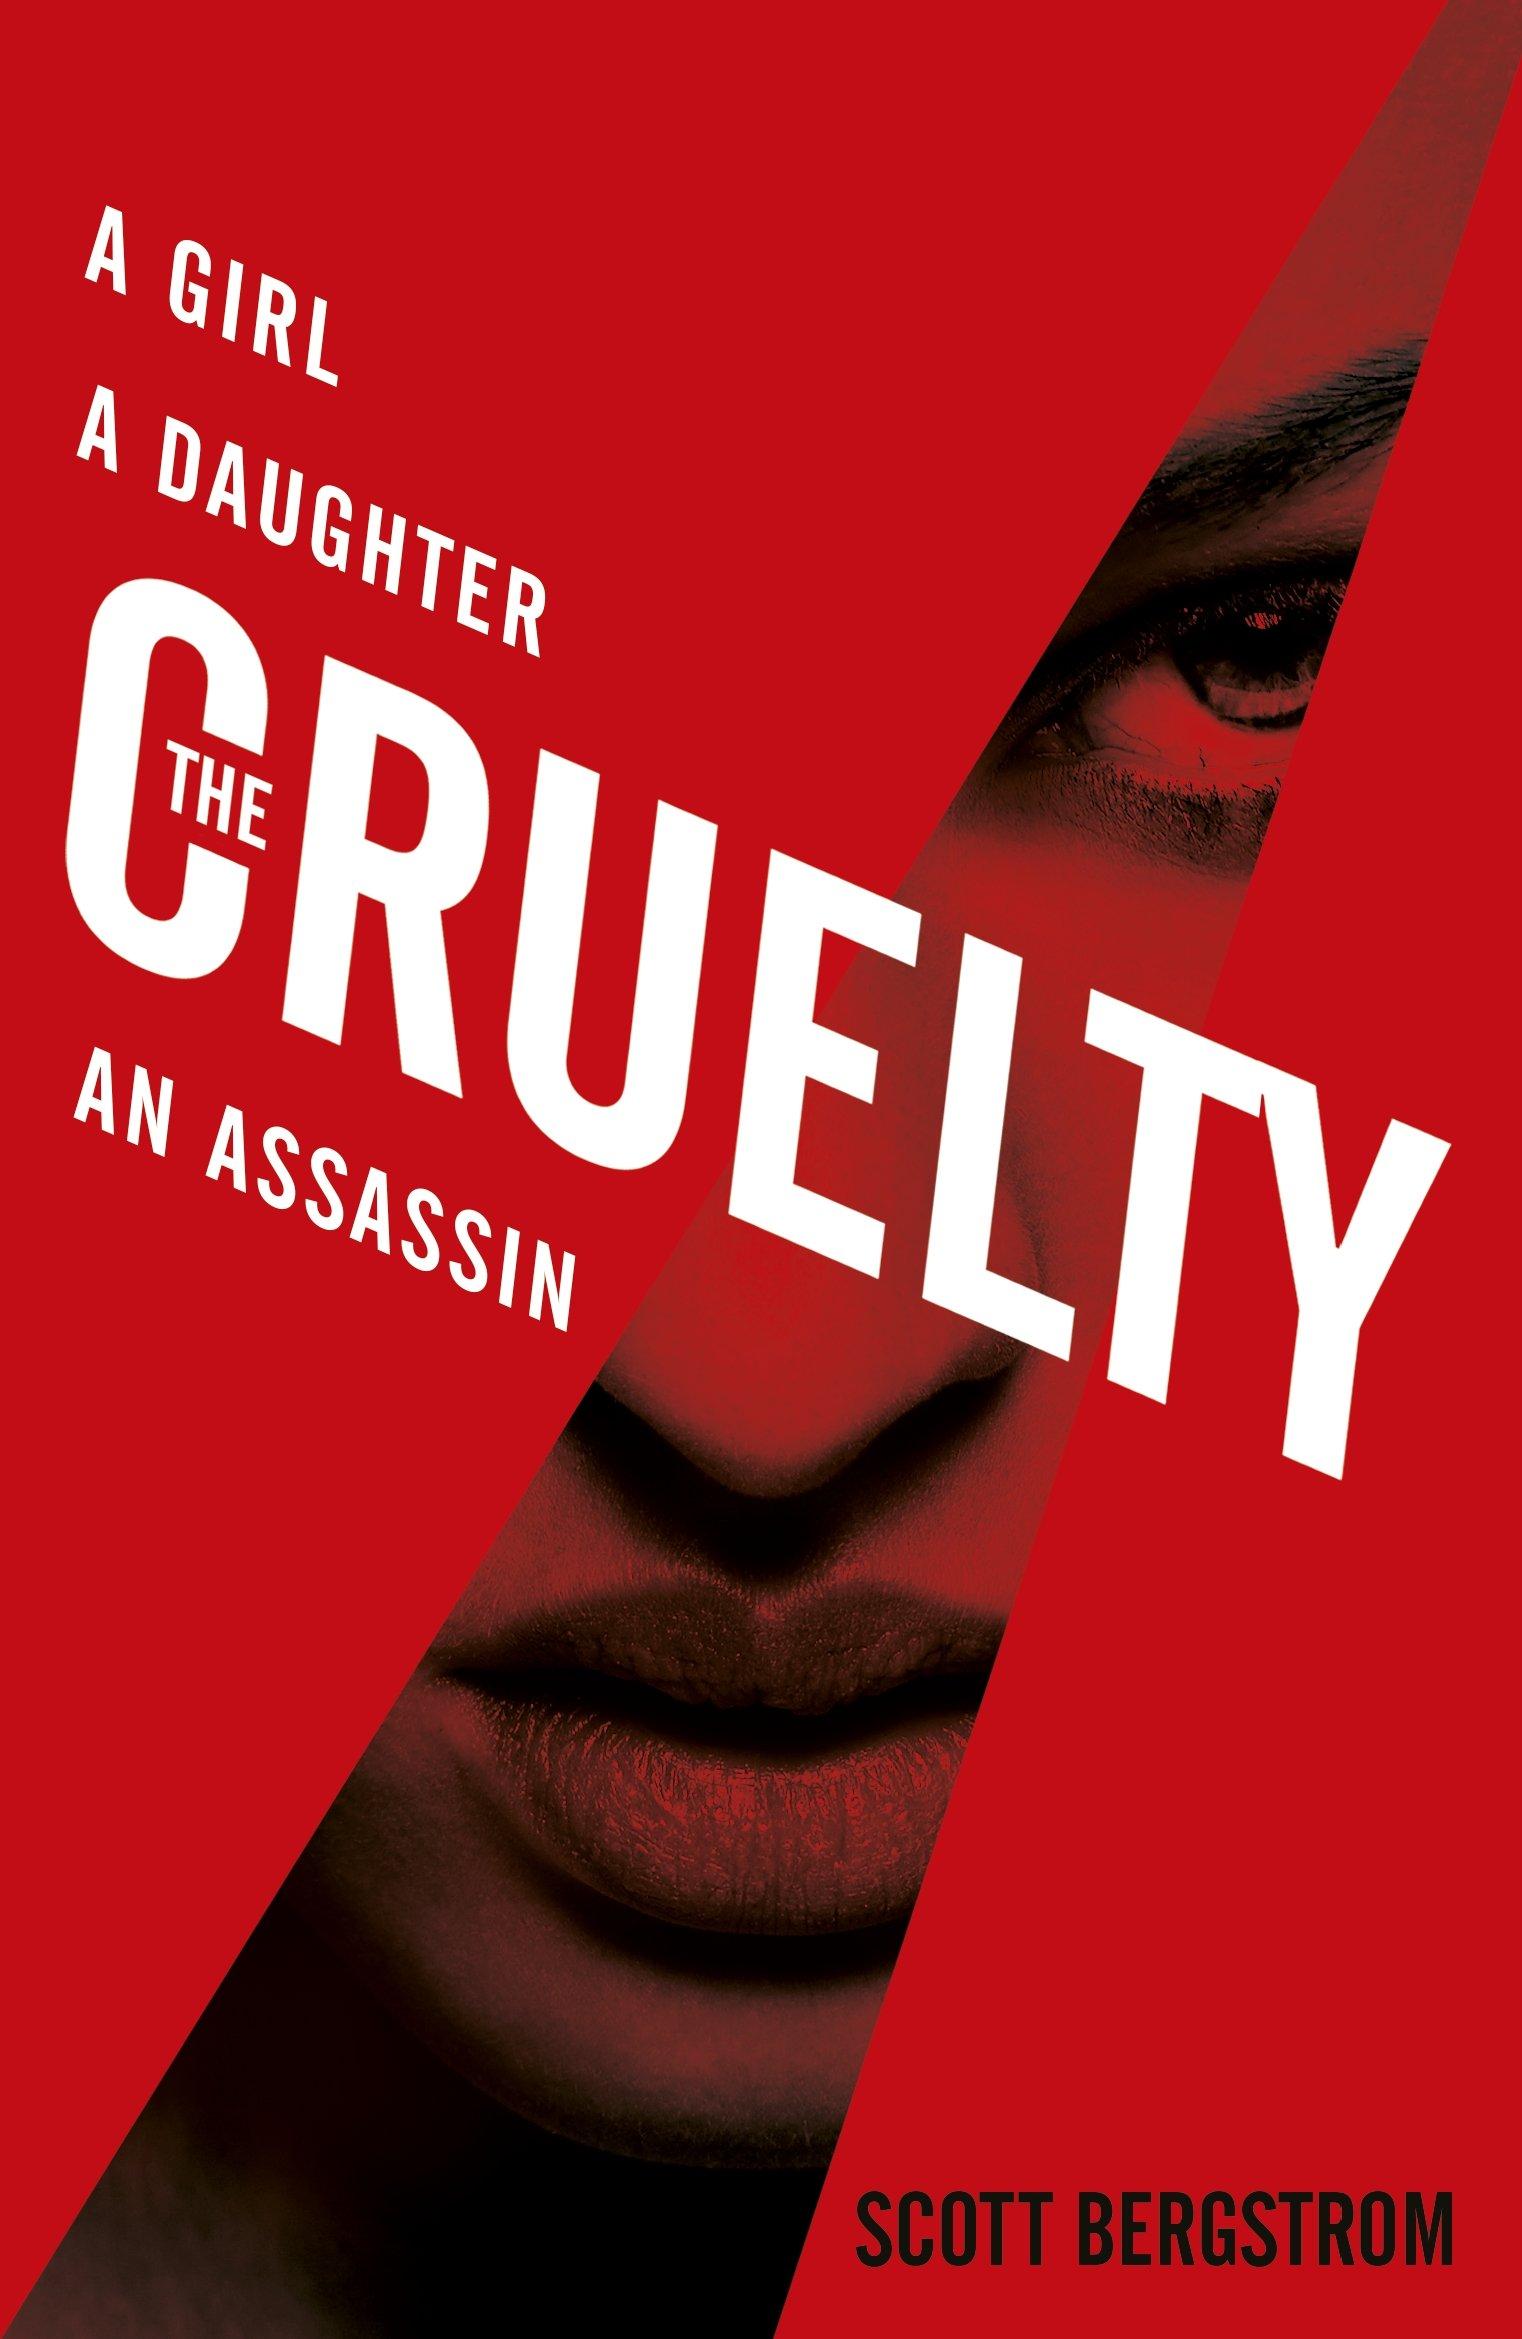 The Cruelty (English Edition)